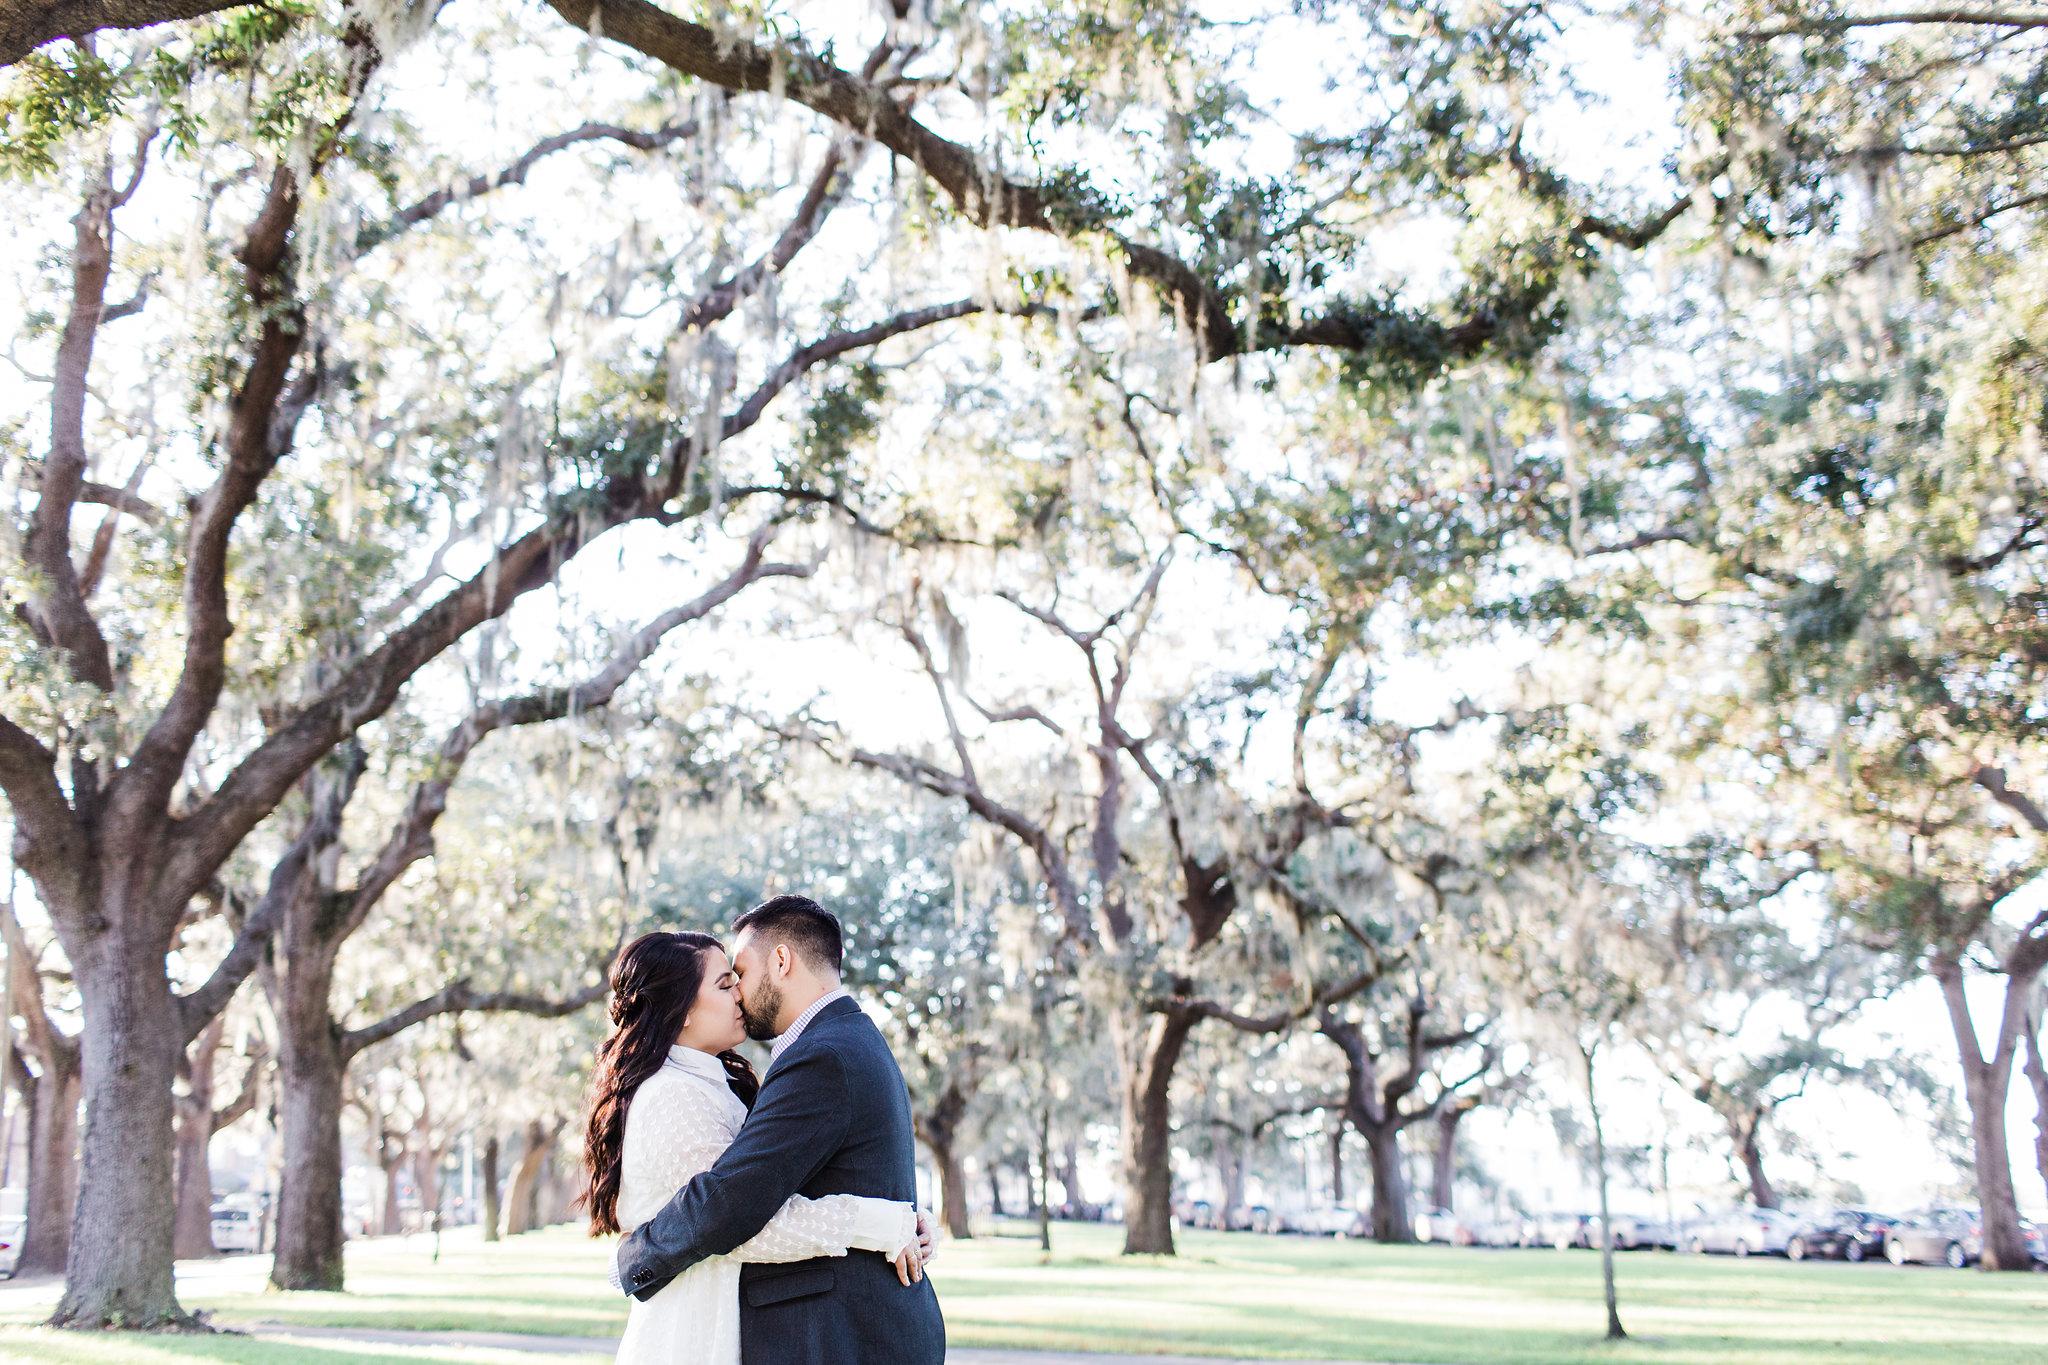 apt-b-photography-Savannah-wedding-photographer-savannah-engagement-photographer-historic-savannah-engagement-savannah-weddings-hilton-head-wedding-photographer-hilton-head-engagement-25.jpg